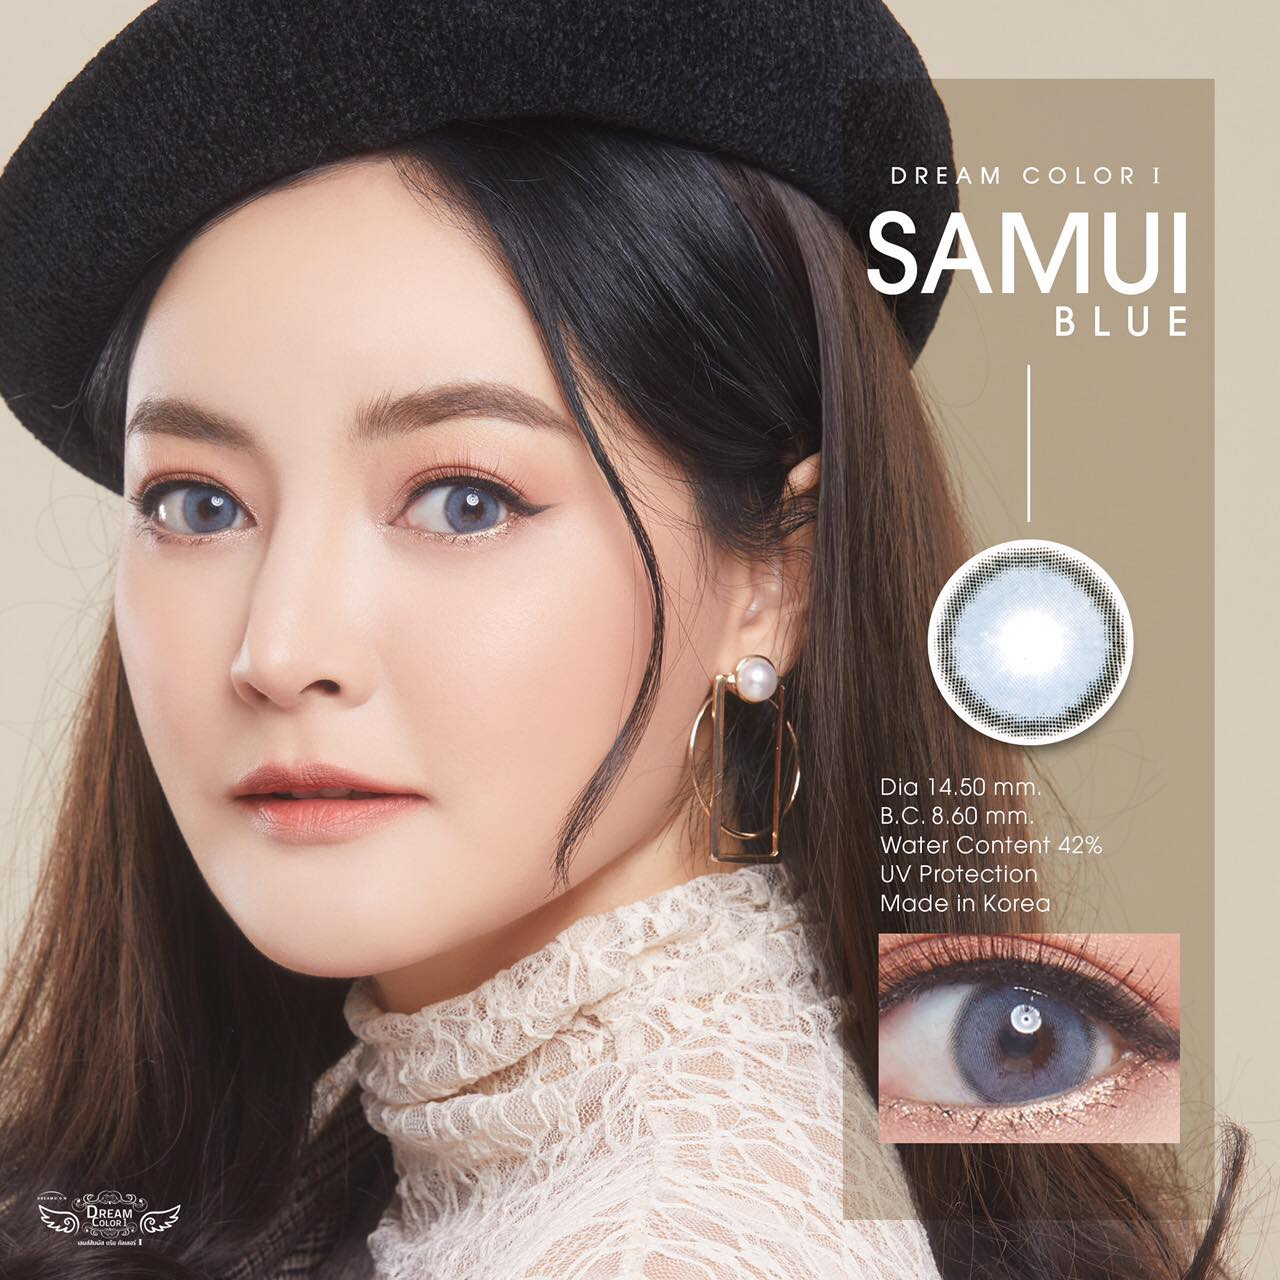 Dreamcolor Samui Blue